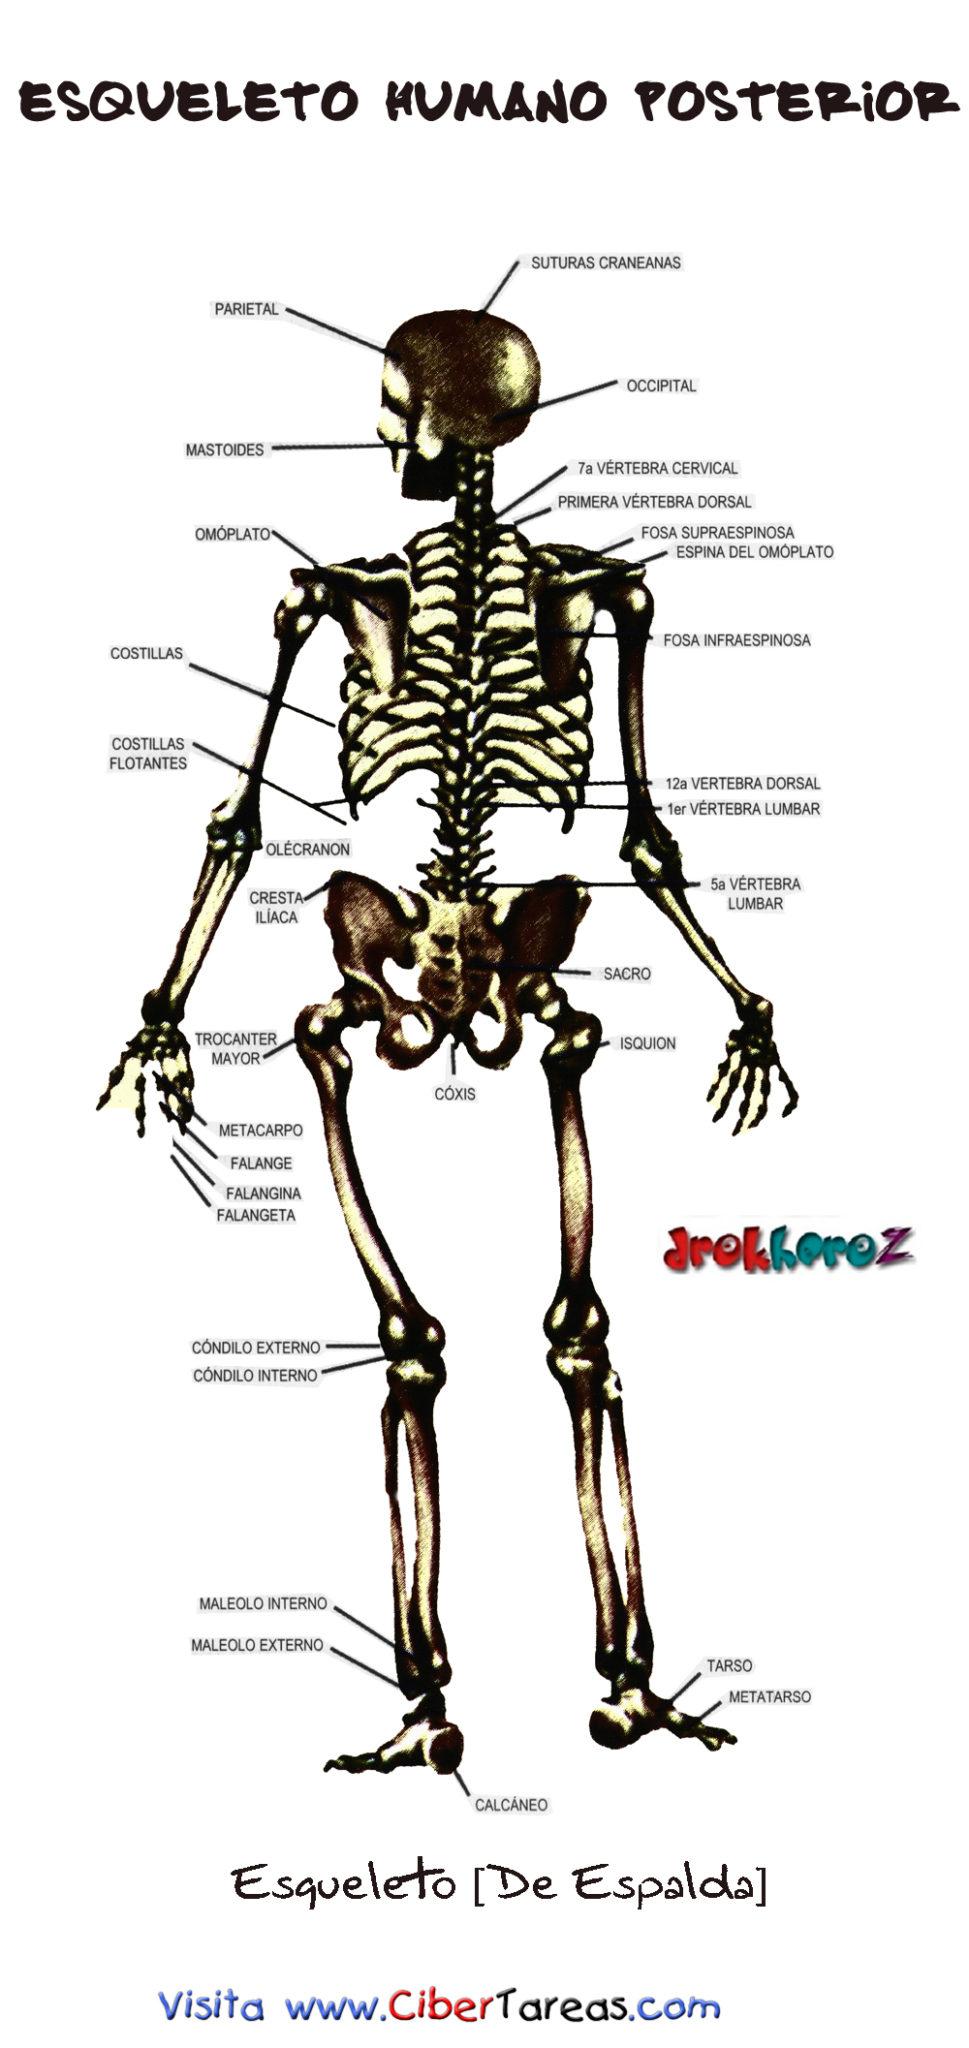 Esqueleto Humano Posterior | CiberTareas